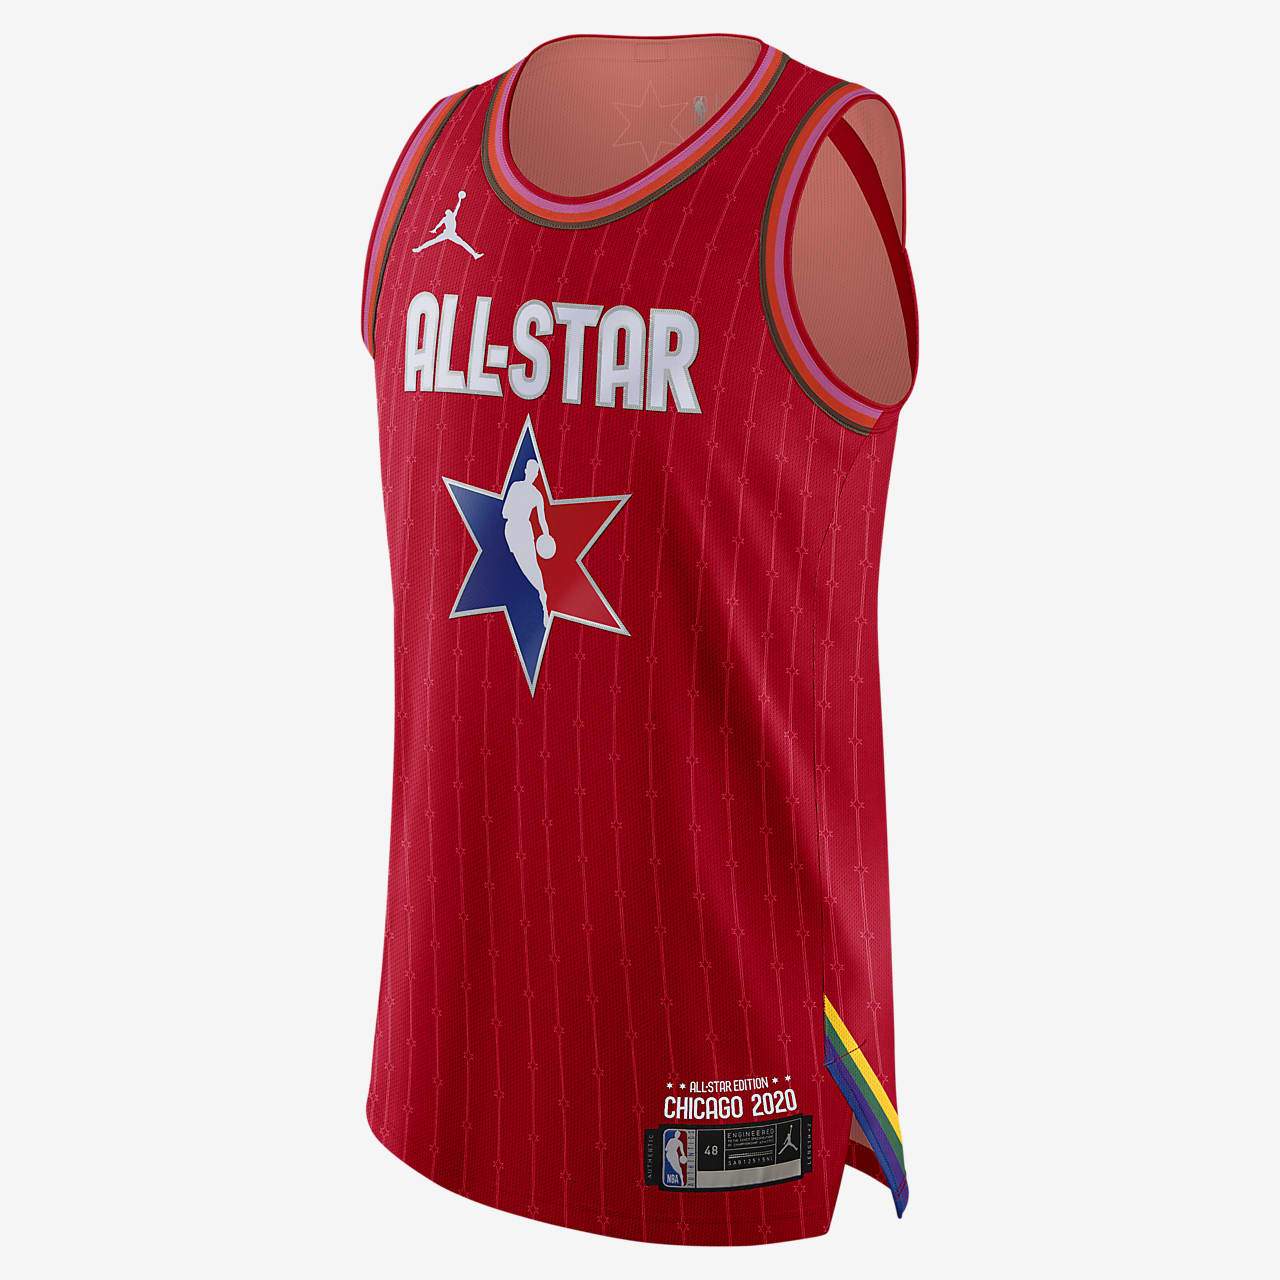 LeBron James All-Star Jordan NBA Authentic Jersey 男子球衣